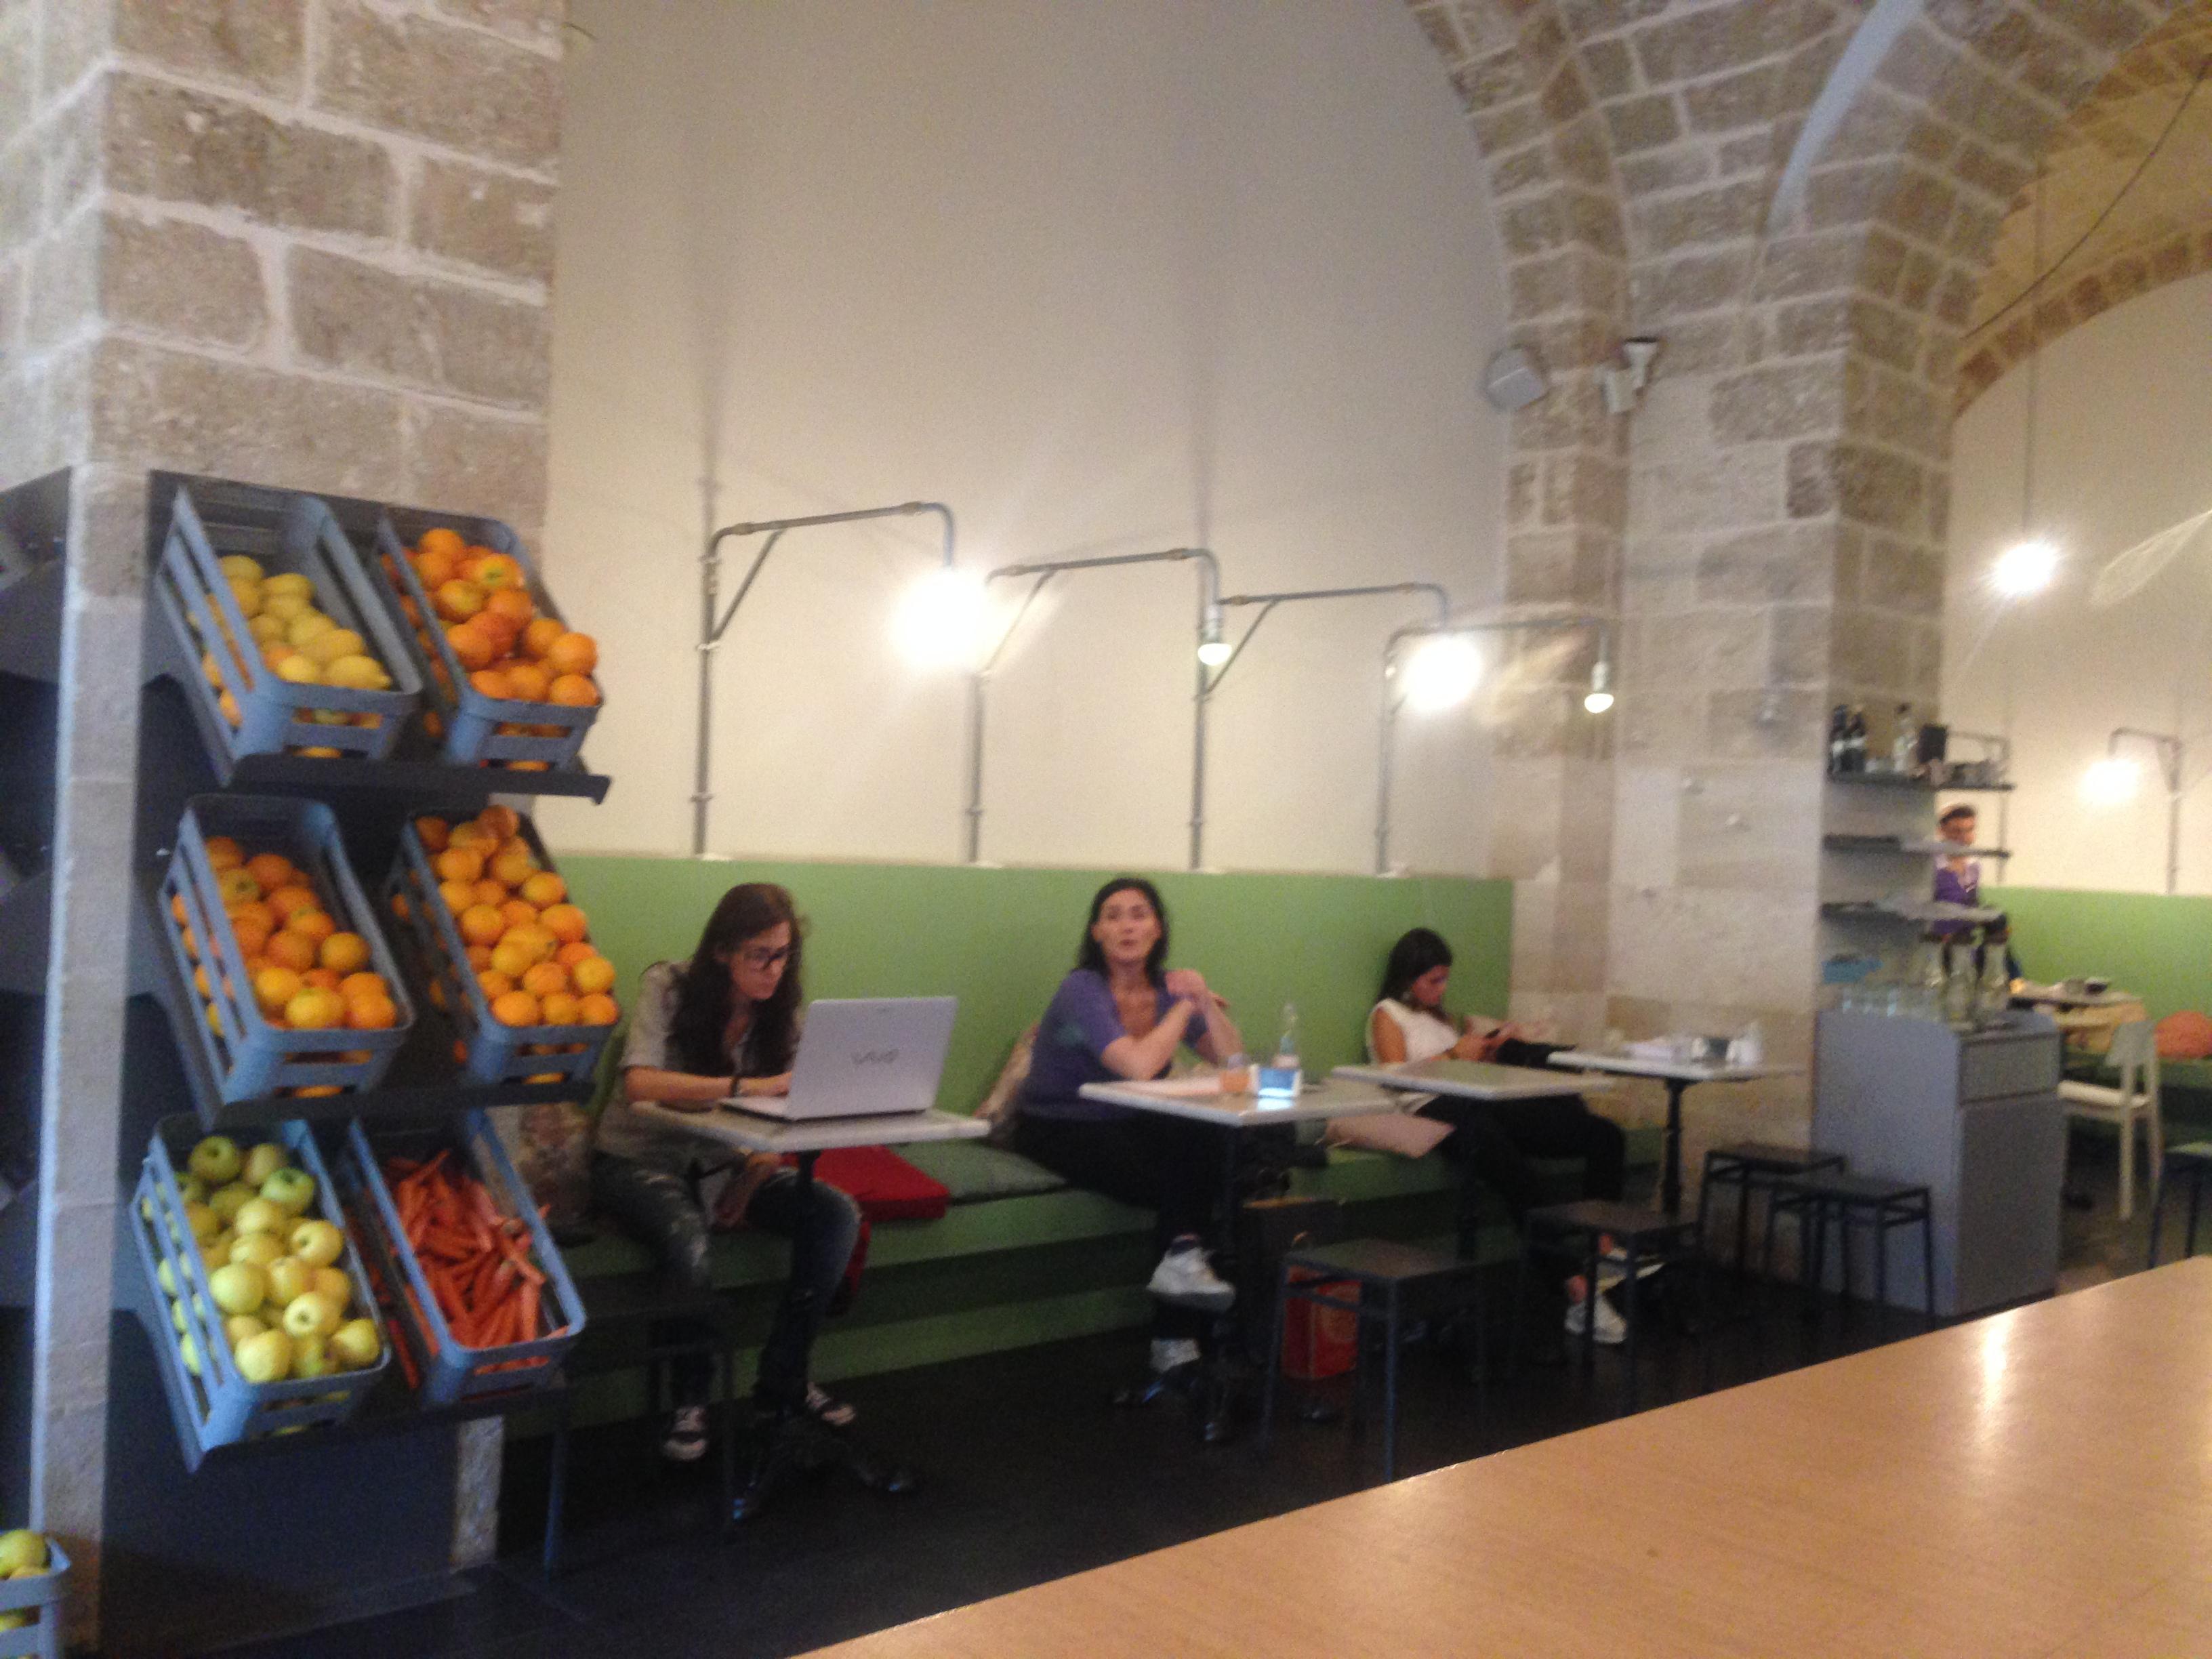 Frulez il bistrot mediterraneo leggi la case history for Arredamento bistrot